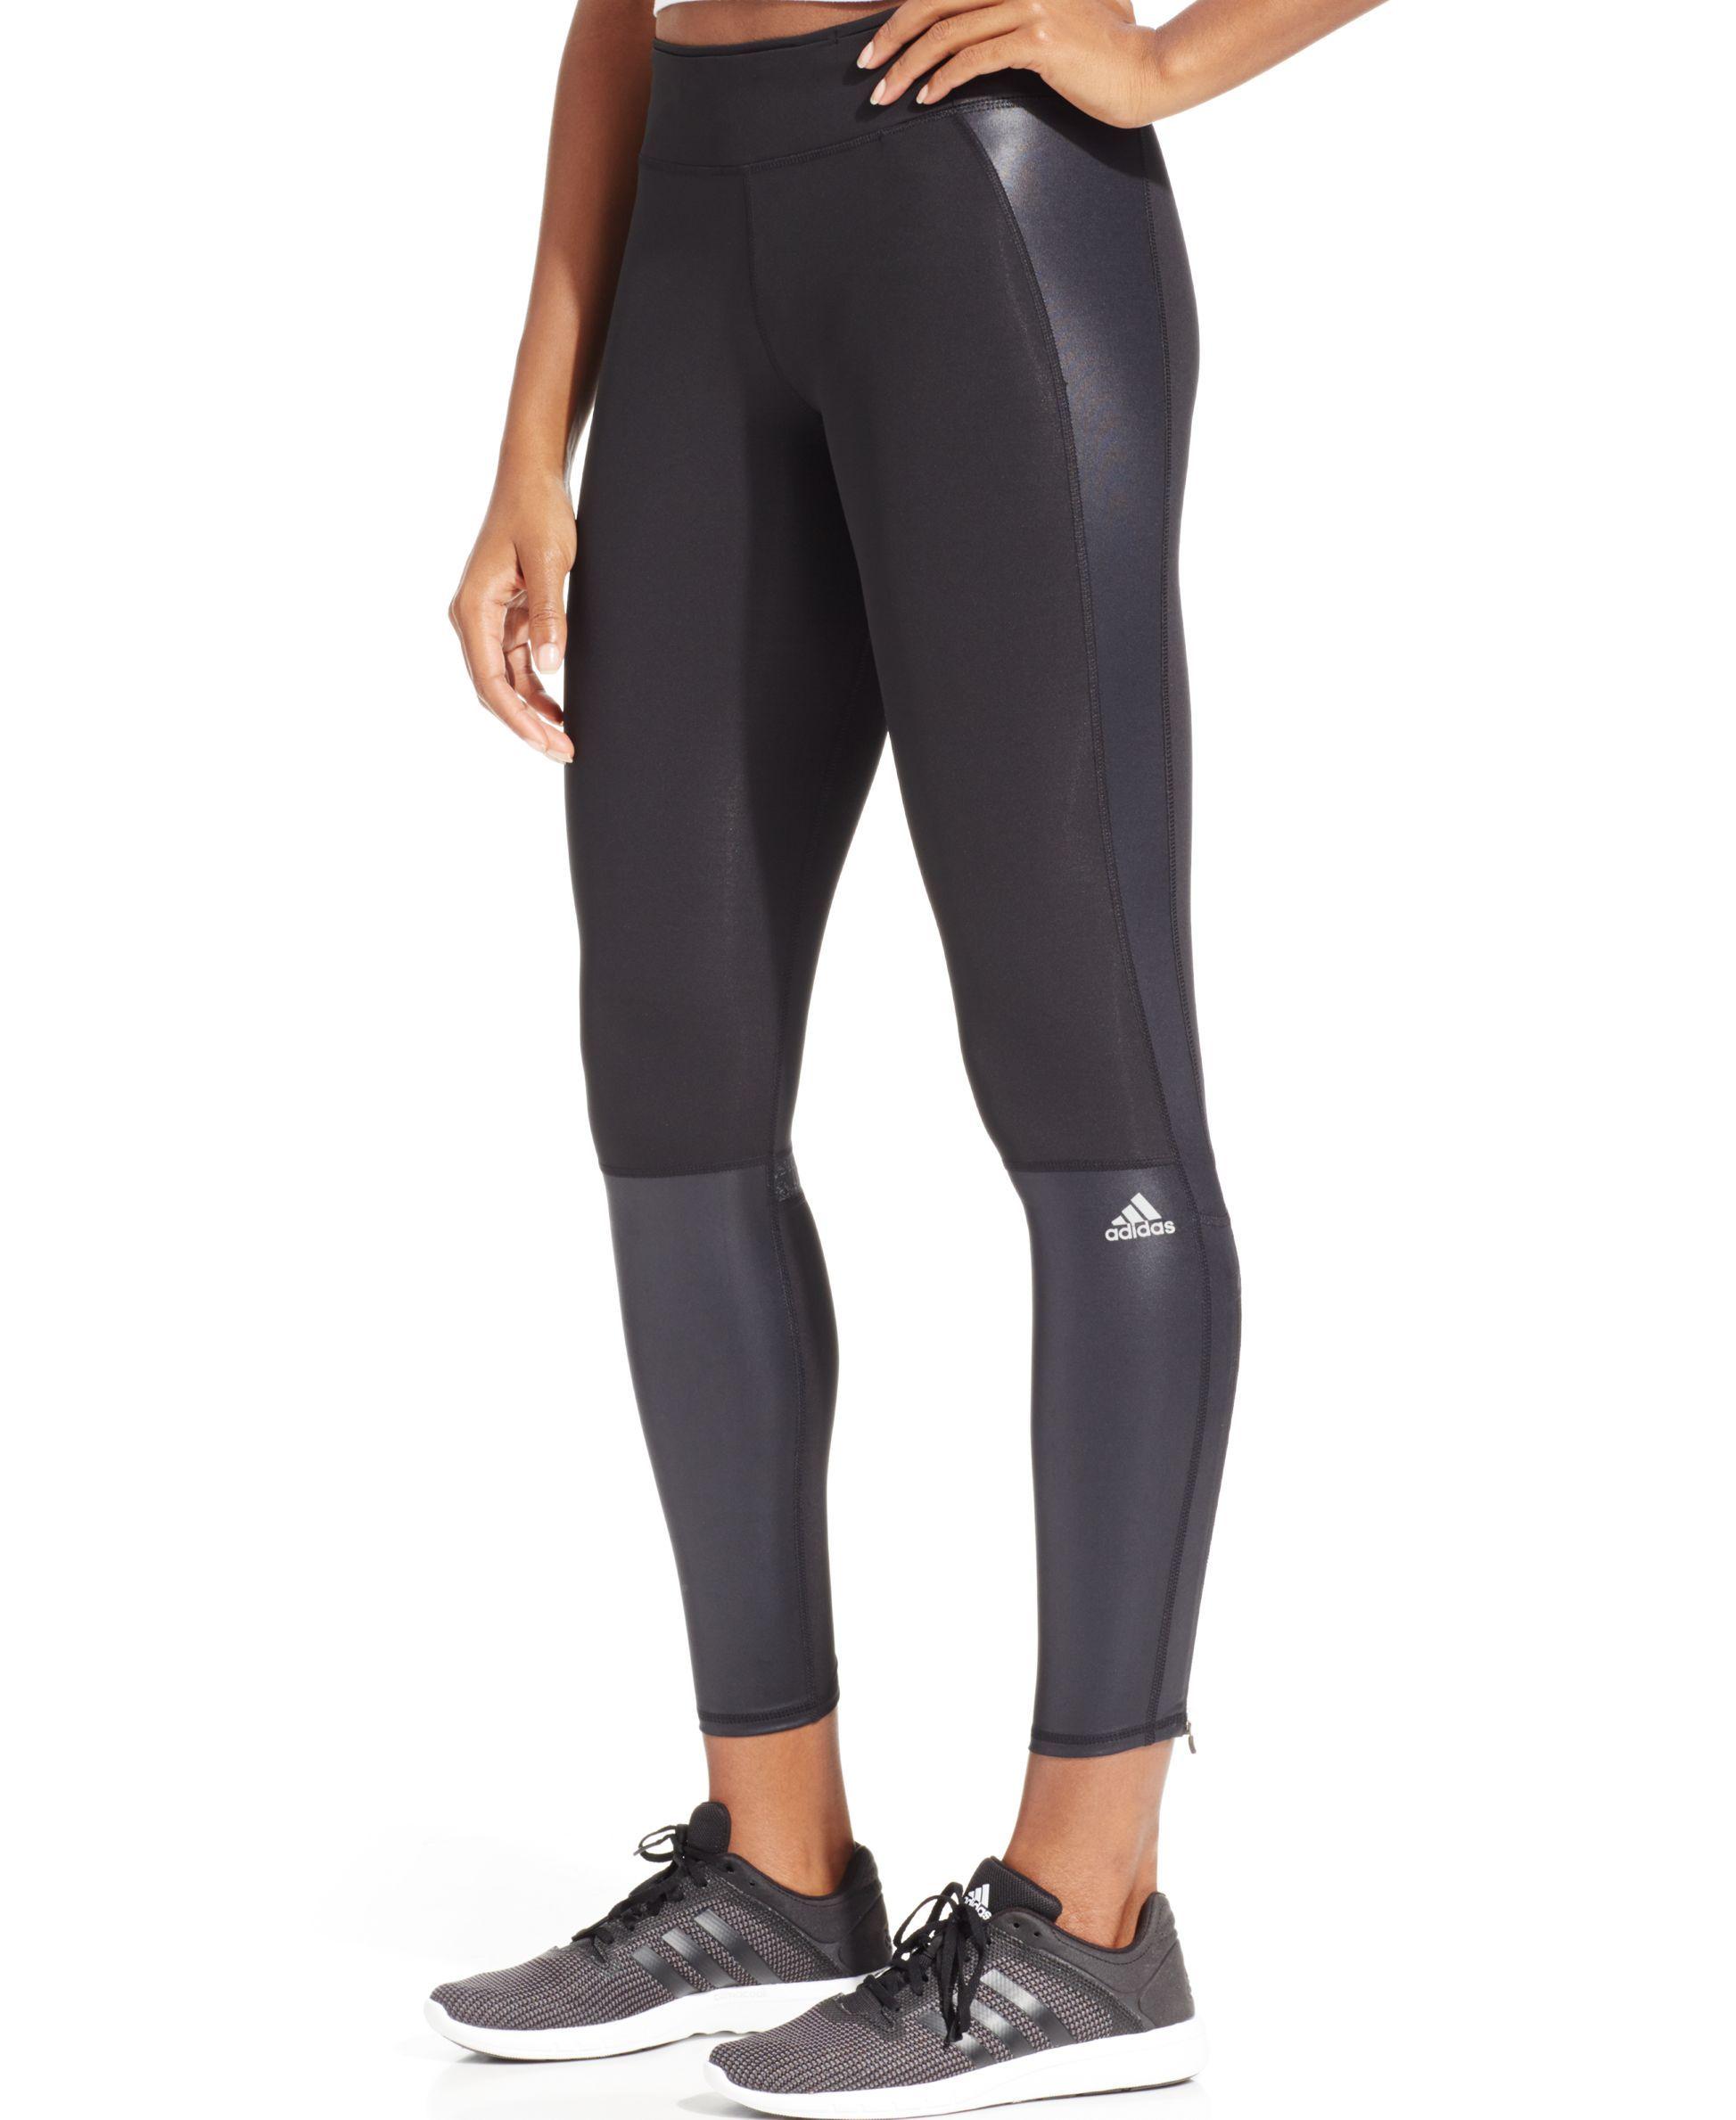 adidas Supernova ClimaCool® Leggings - Activewear - Women - Macy's